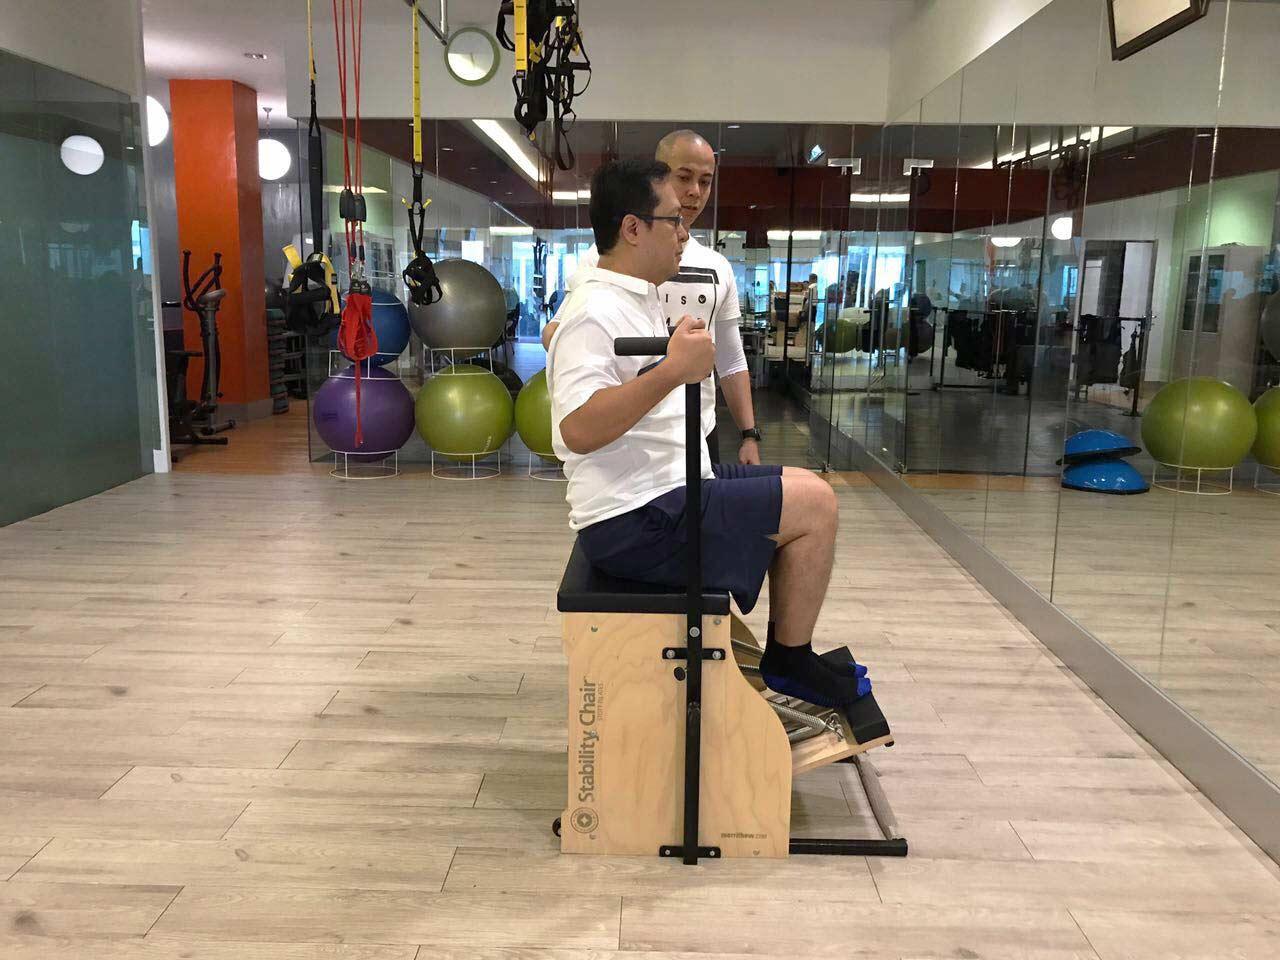 Testimoni Pilates dari Adika Ryanto